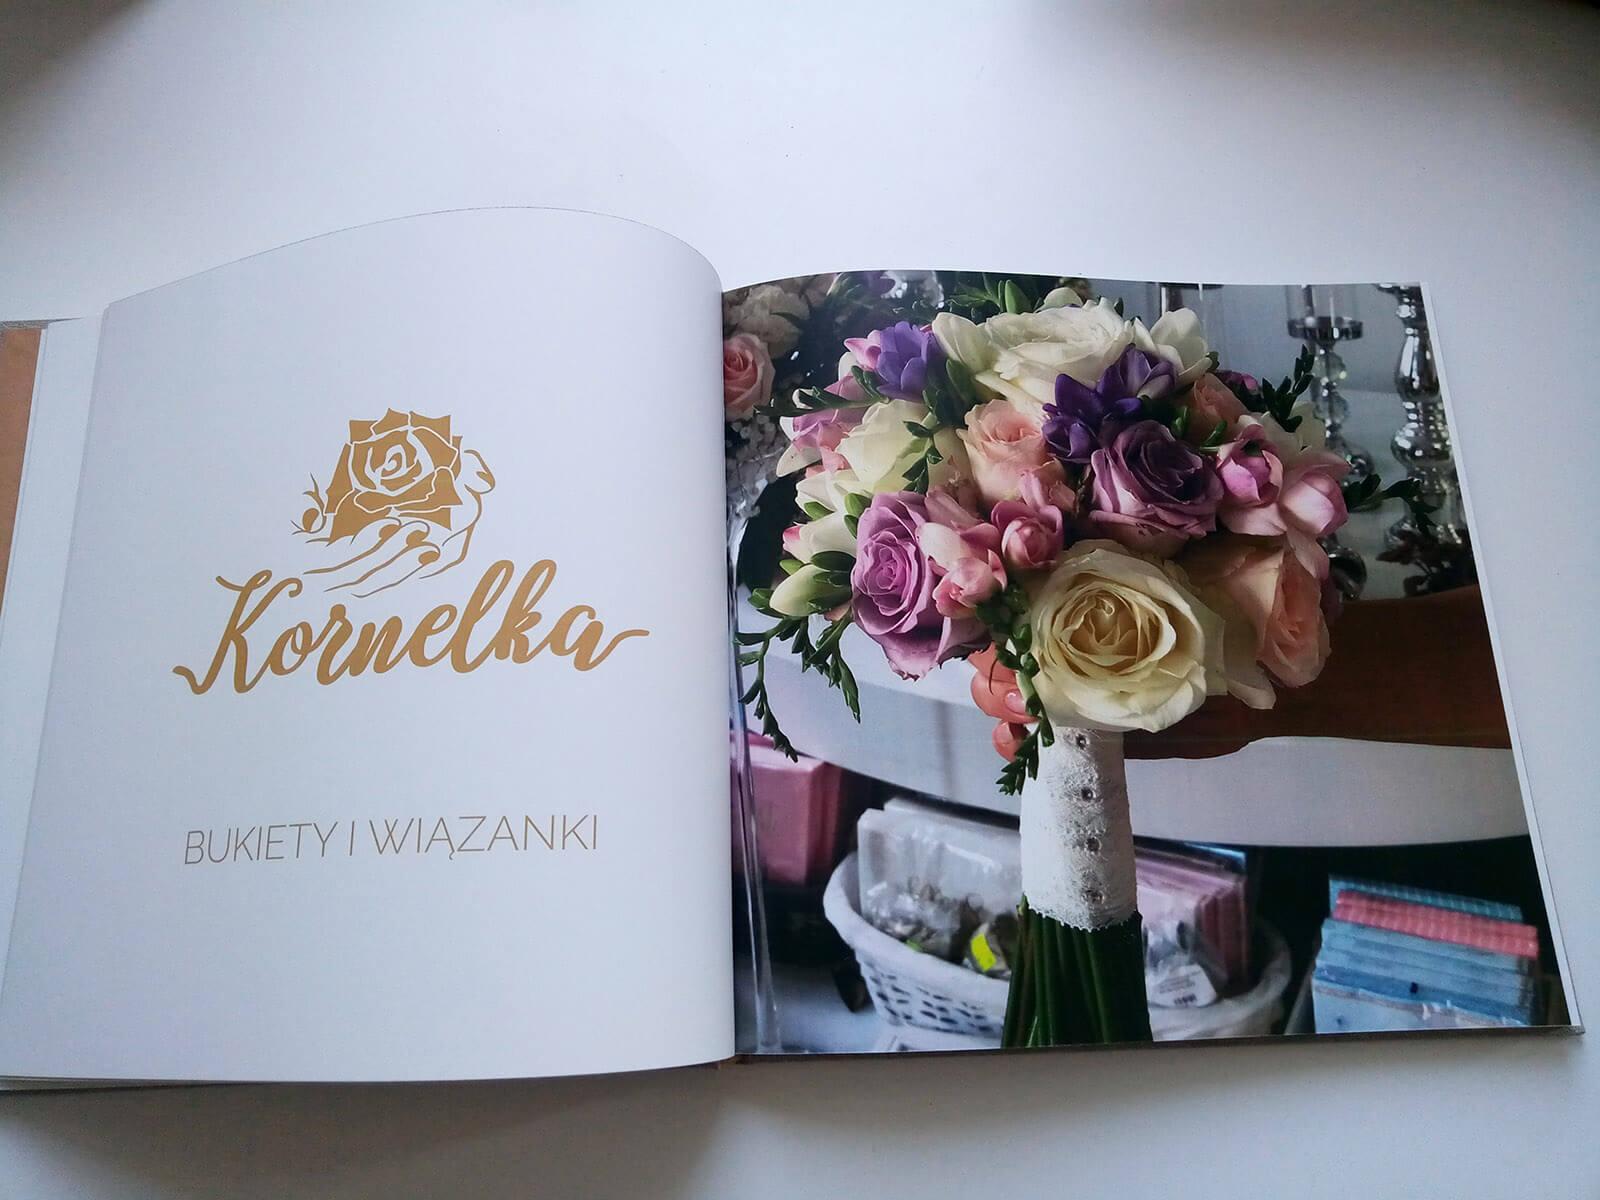 Katalog Kornelka